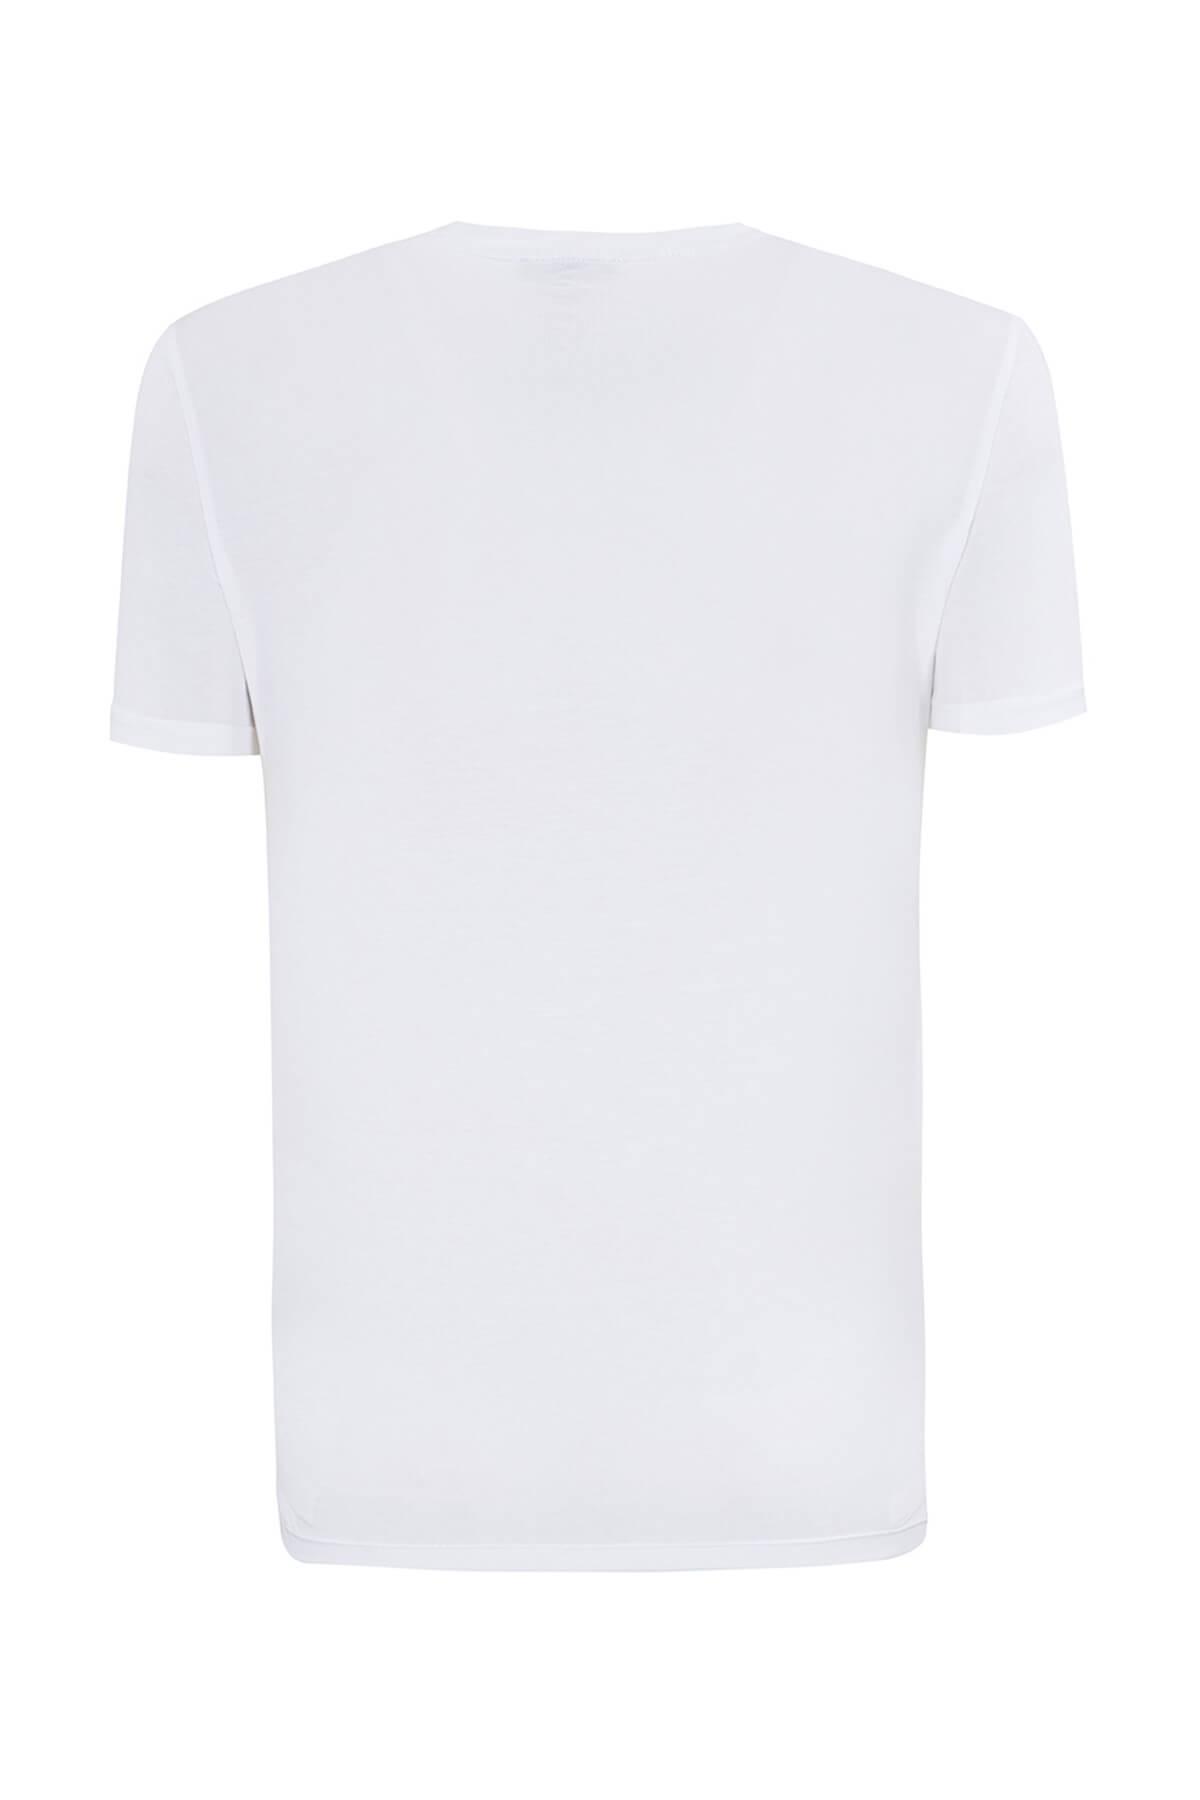 Emporio Armani Beyaz Kadın T-Shirt 2